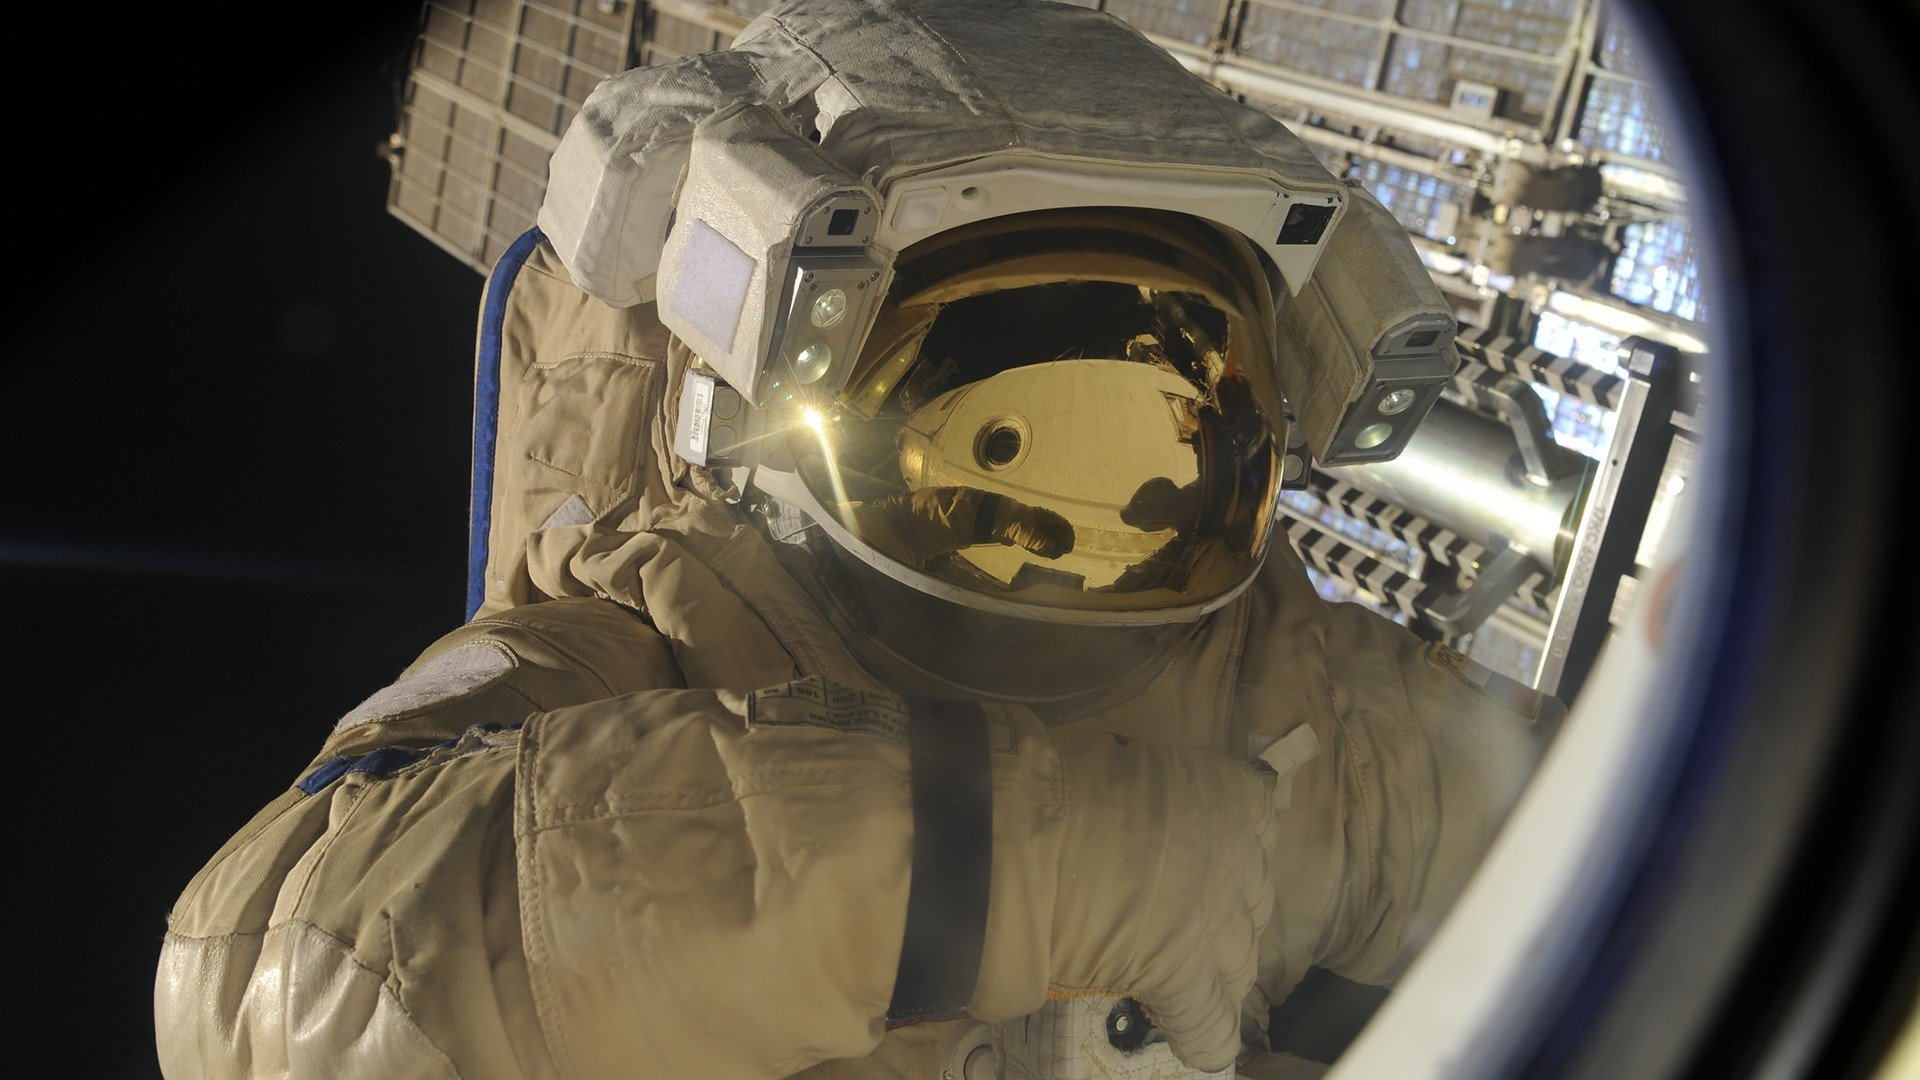 nasa international space station information - photo #20